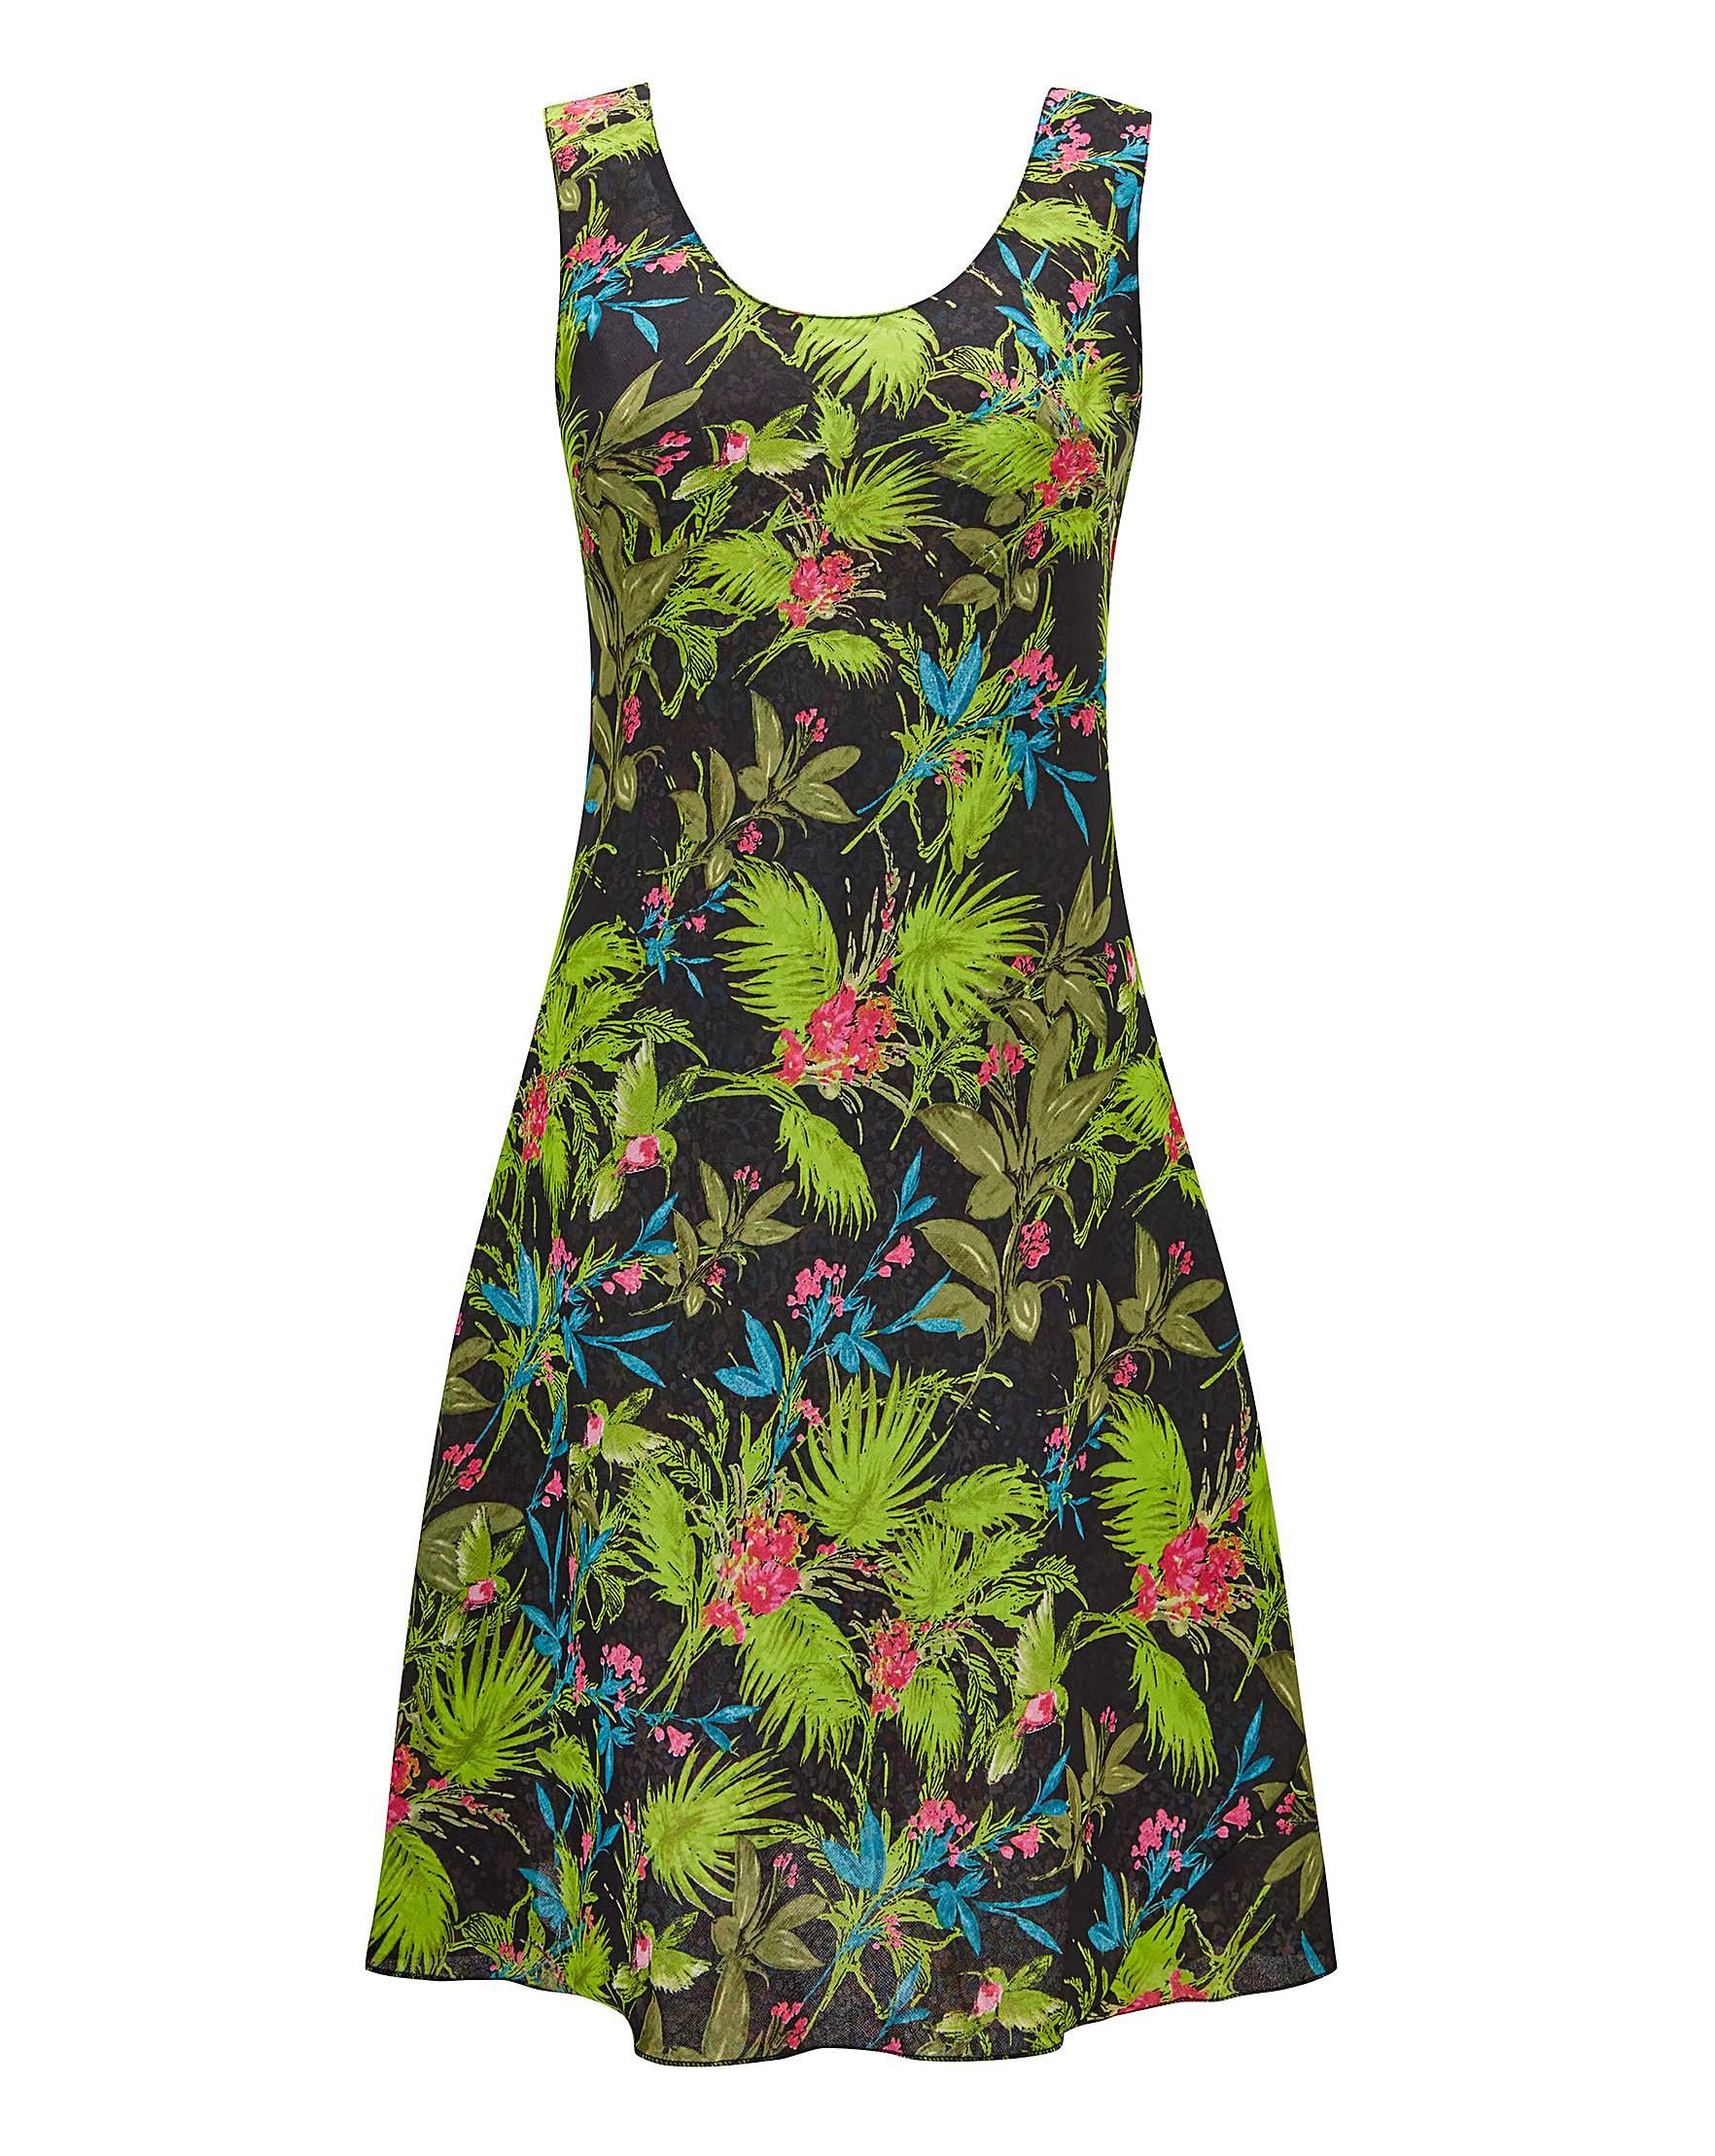 fad47ee700a Joe Browns Ravishingley Reversible Dress